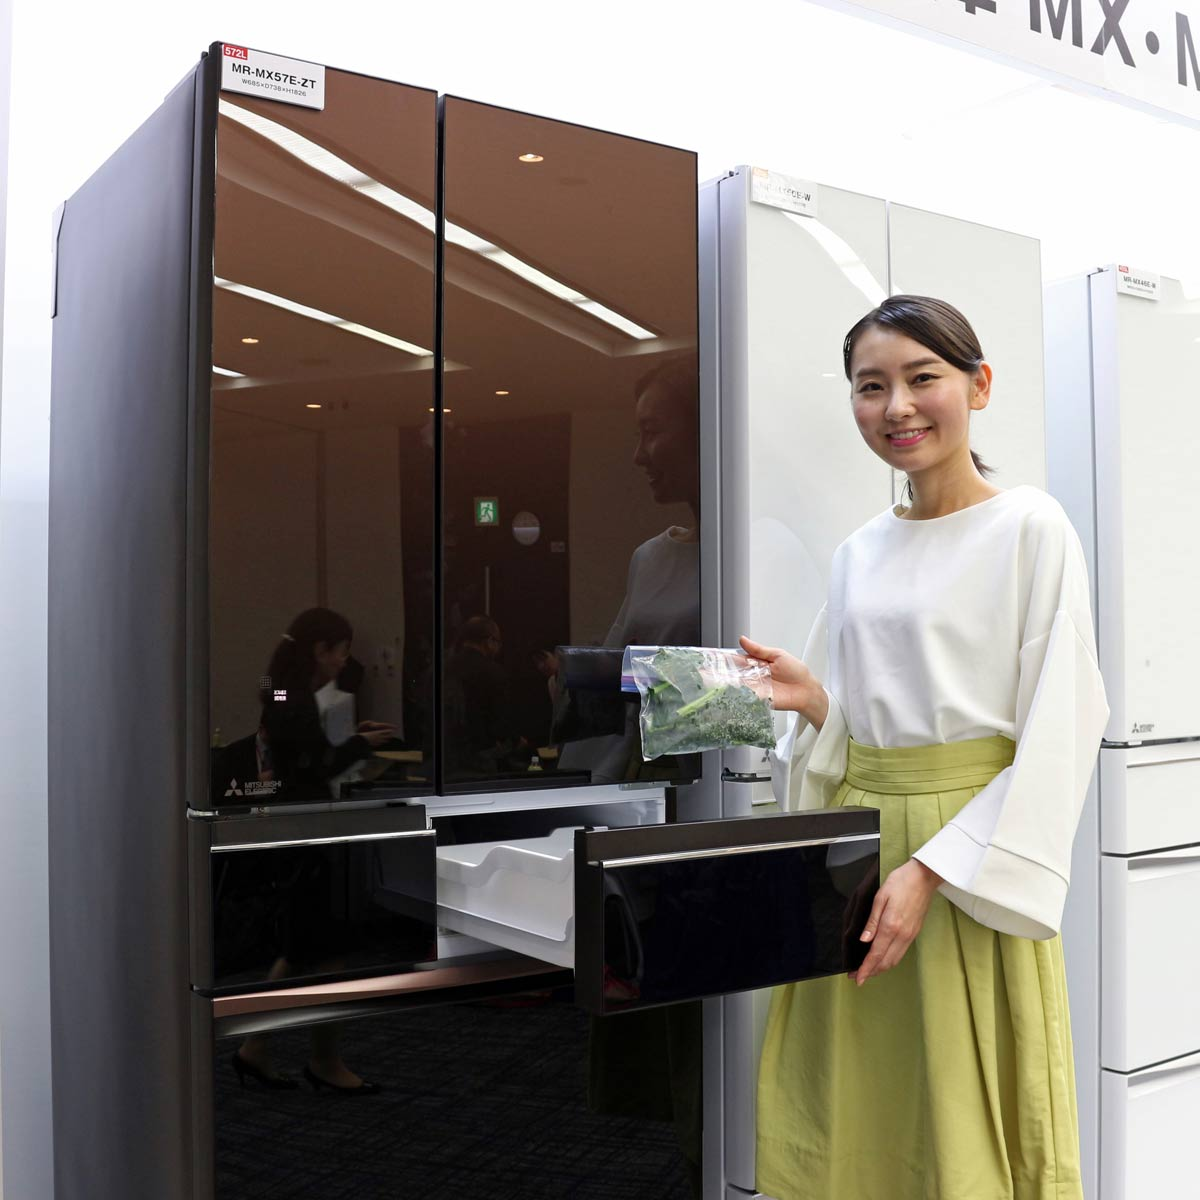 AI機能を搭載! 三菱電機の新・冷蔵庫で「切れちゃう瞬冷凍」はどう進化した?